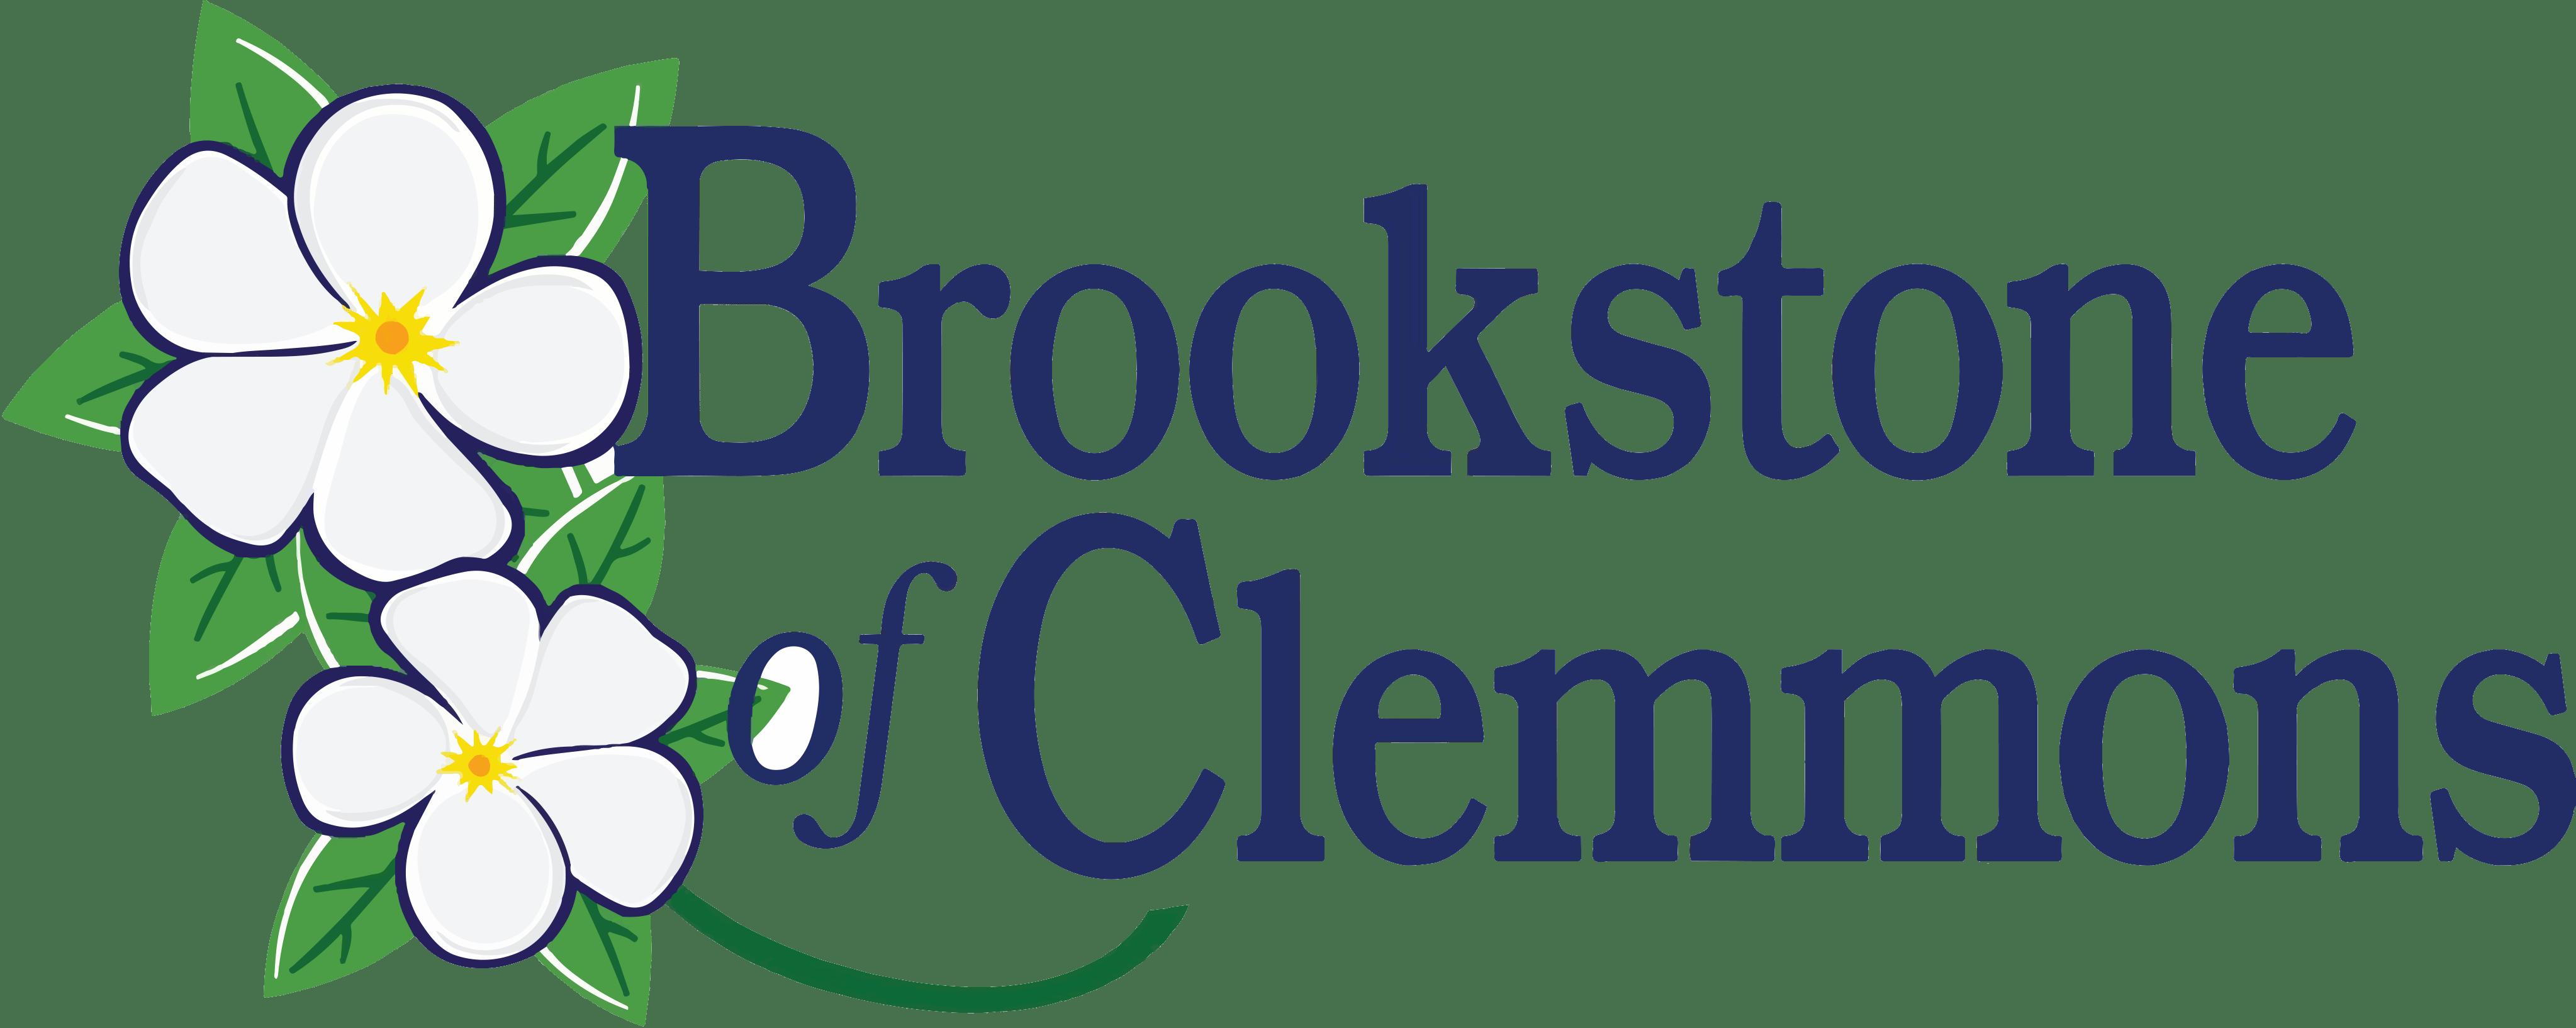 Brookstone of Clemmons